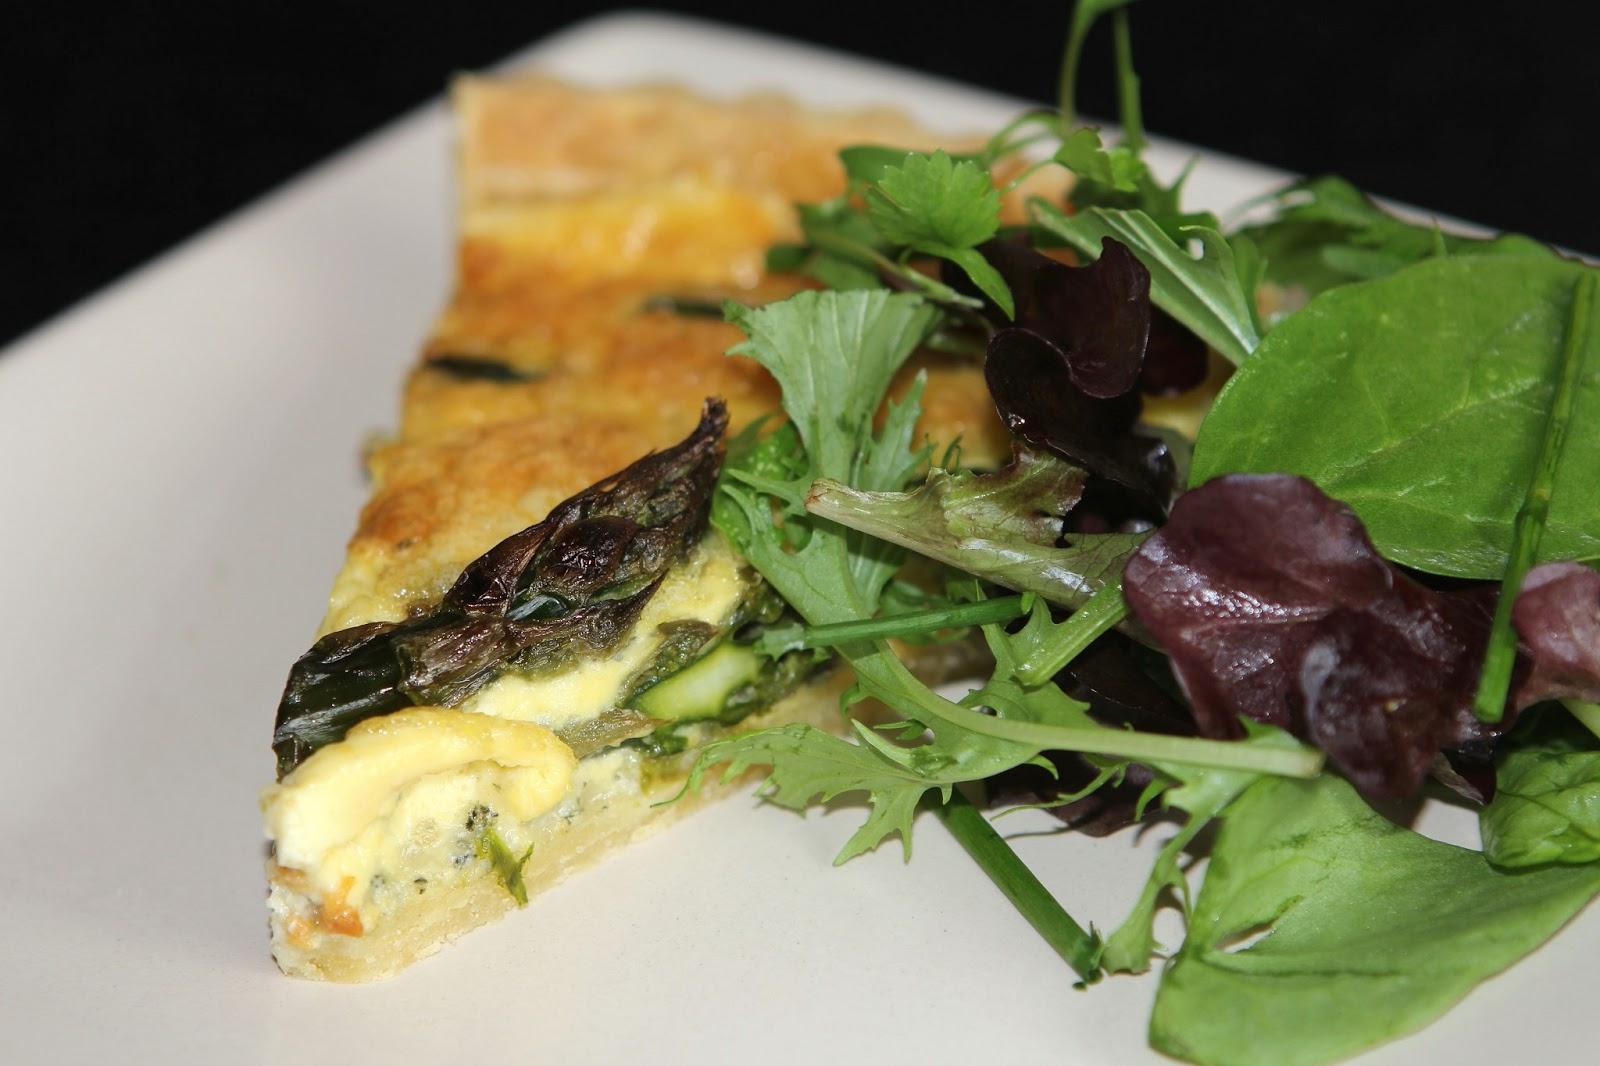 Gluten Free Alchemist: A Seasonal English Quiche - Asparagus & Stilton